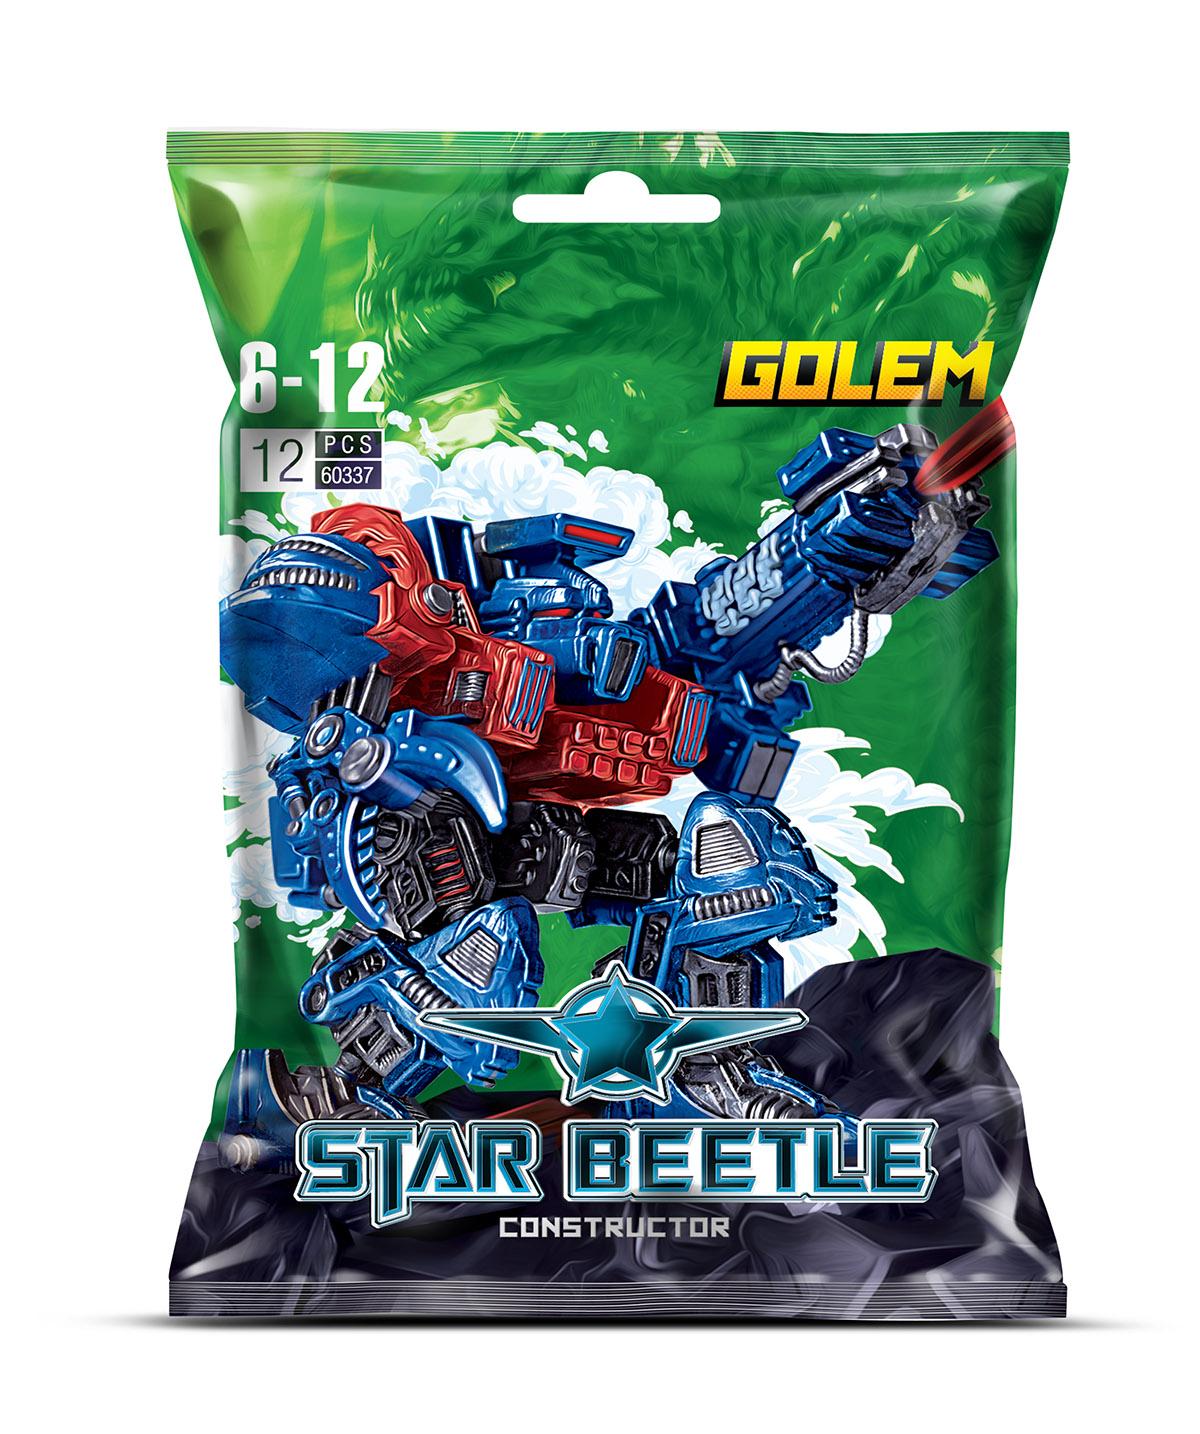 Zormaer Конструктор Star Beetle Golem